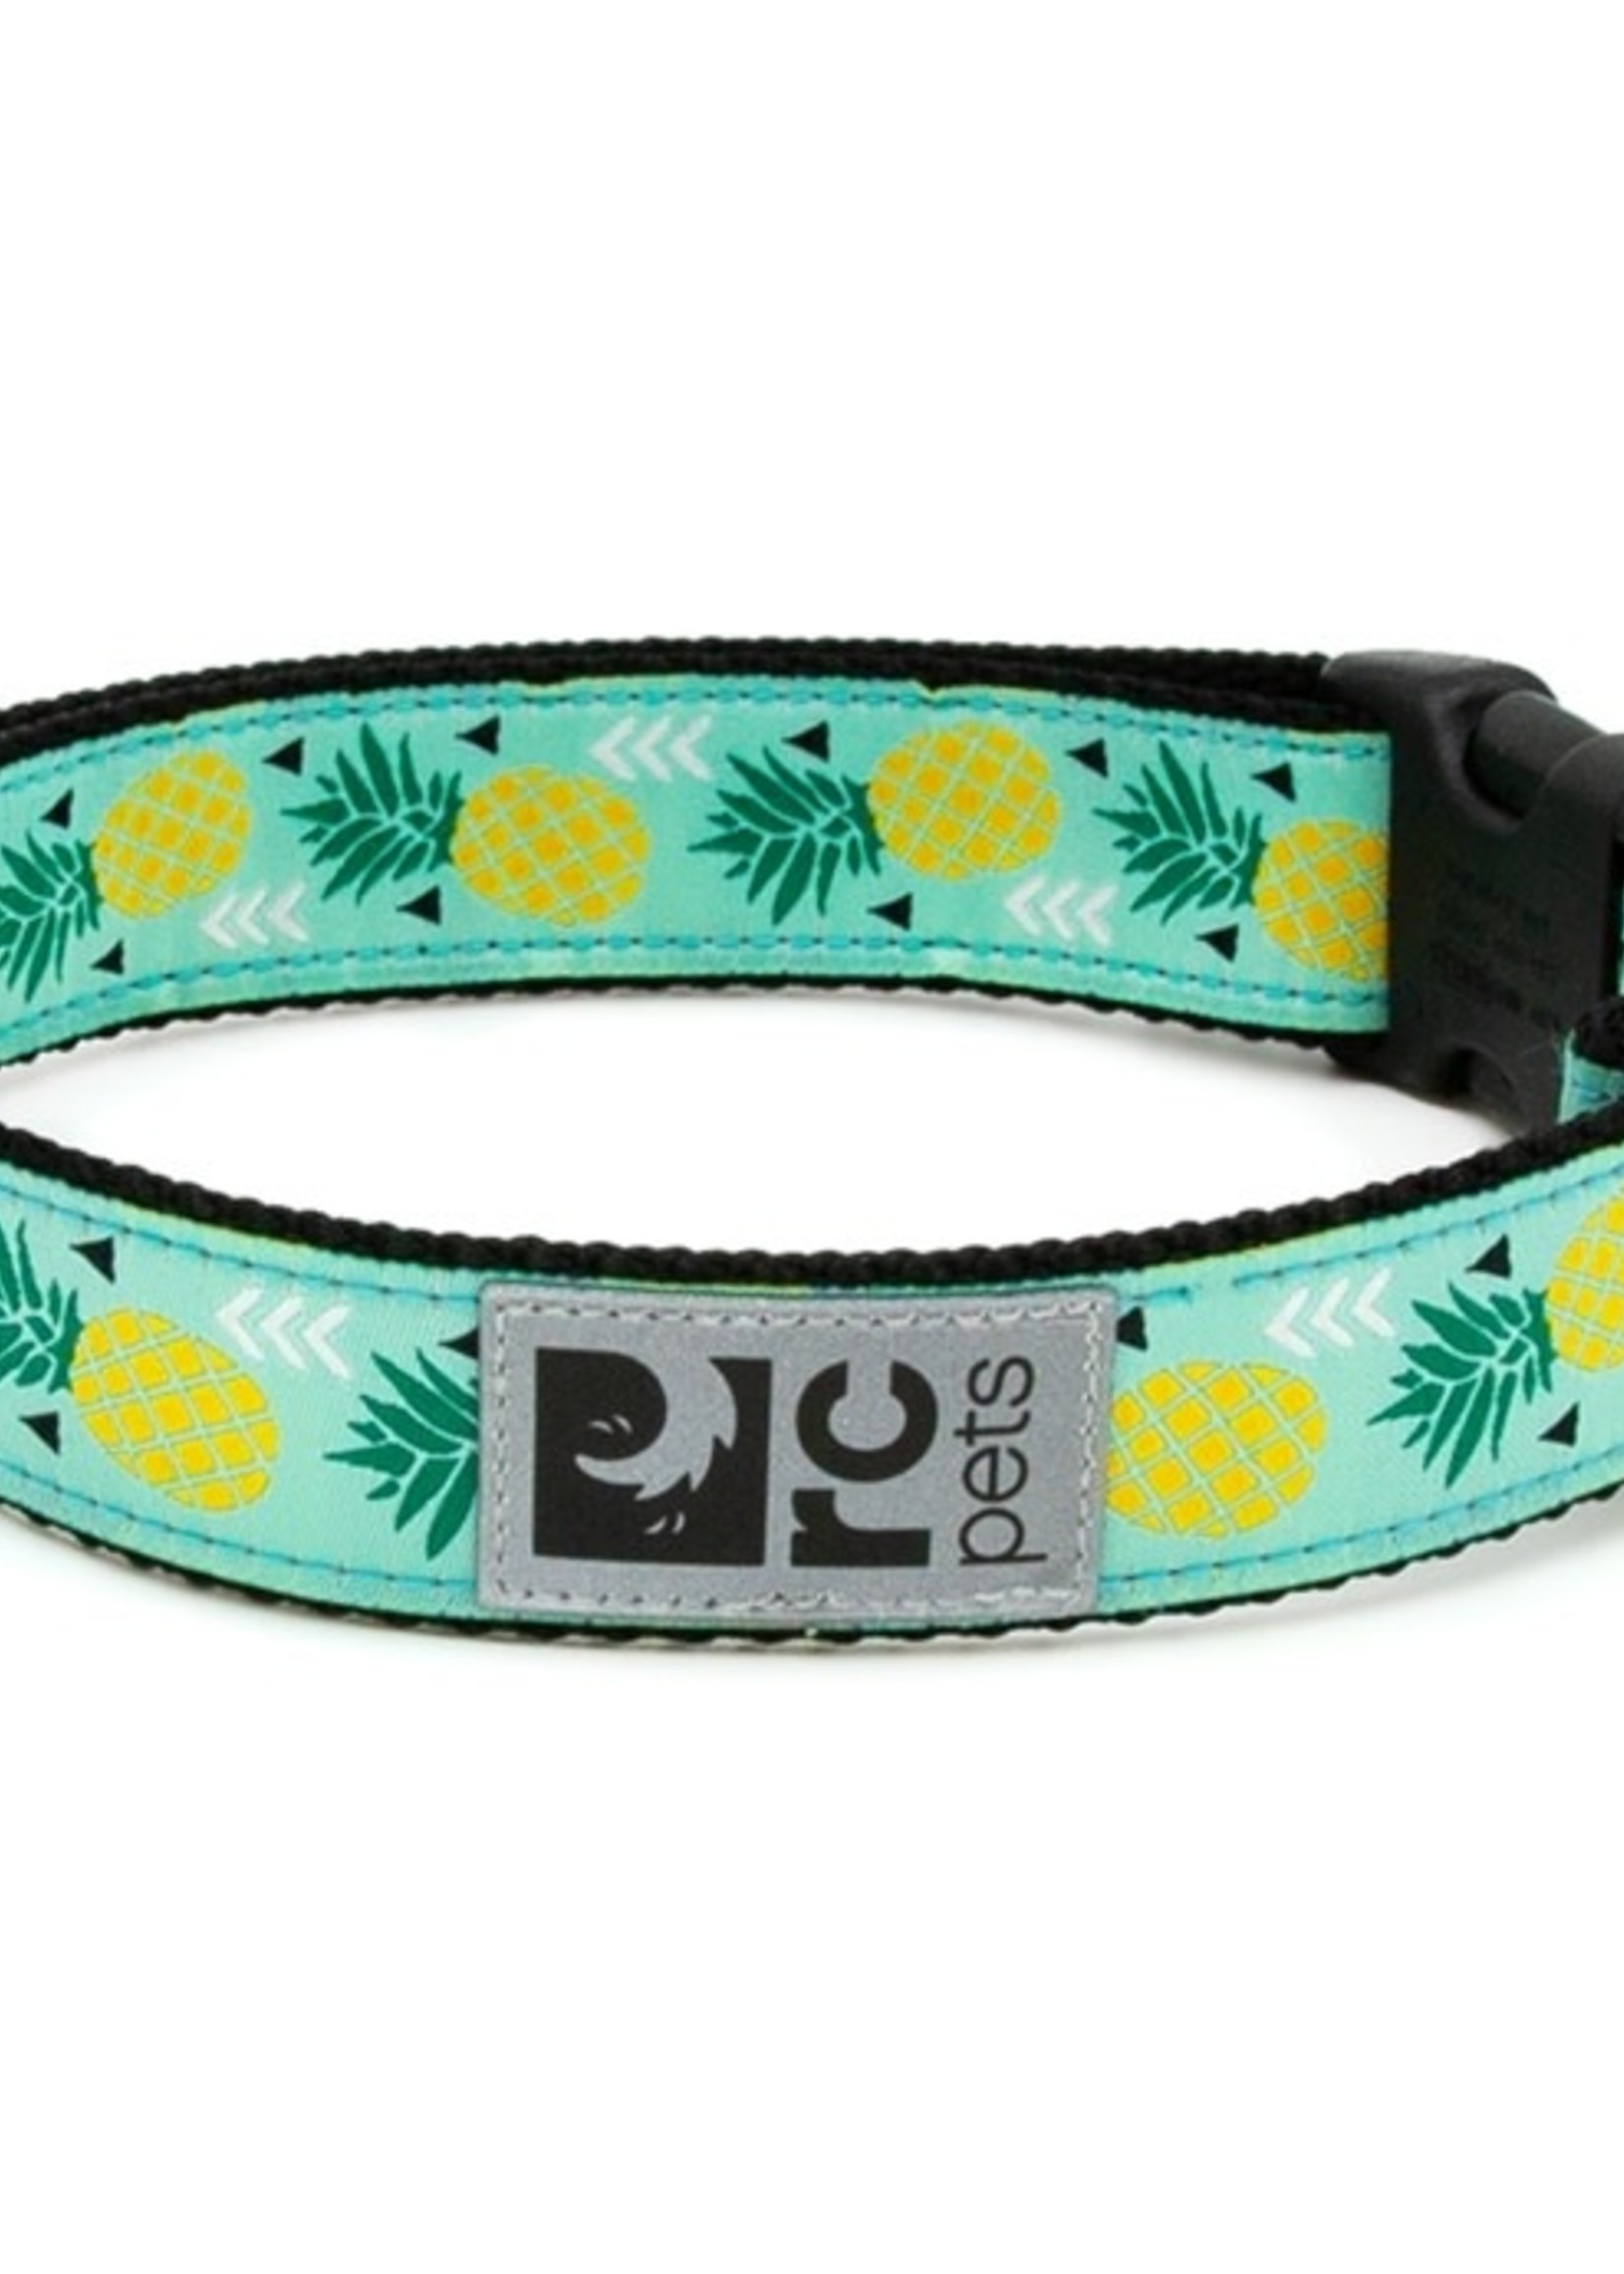 RC Pets Clip Collar M 1 Pineapple Parade